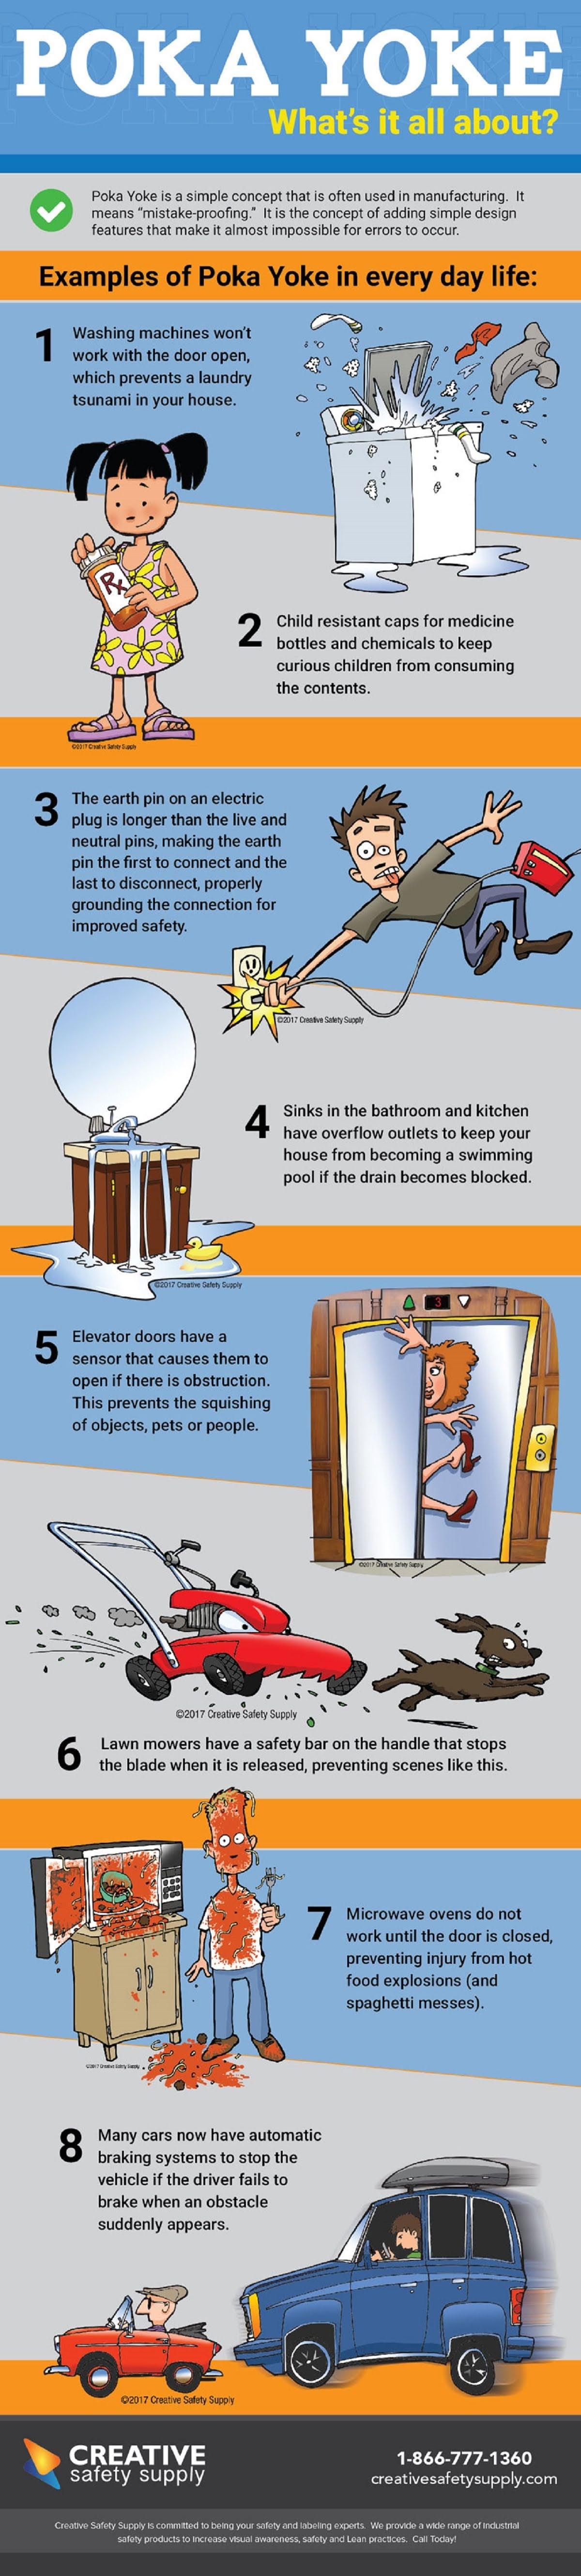 poka-yoke-whats-it-all-about-infographic